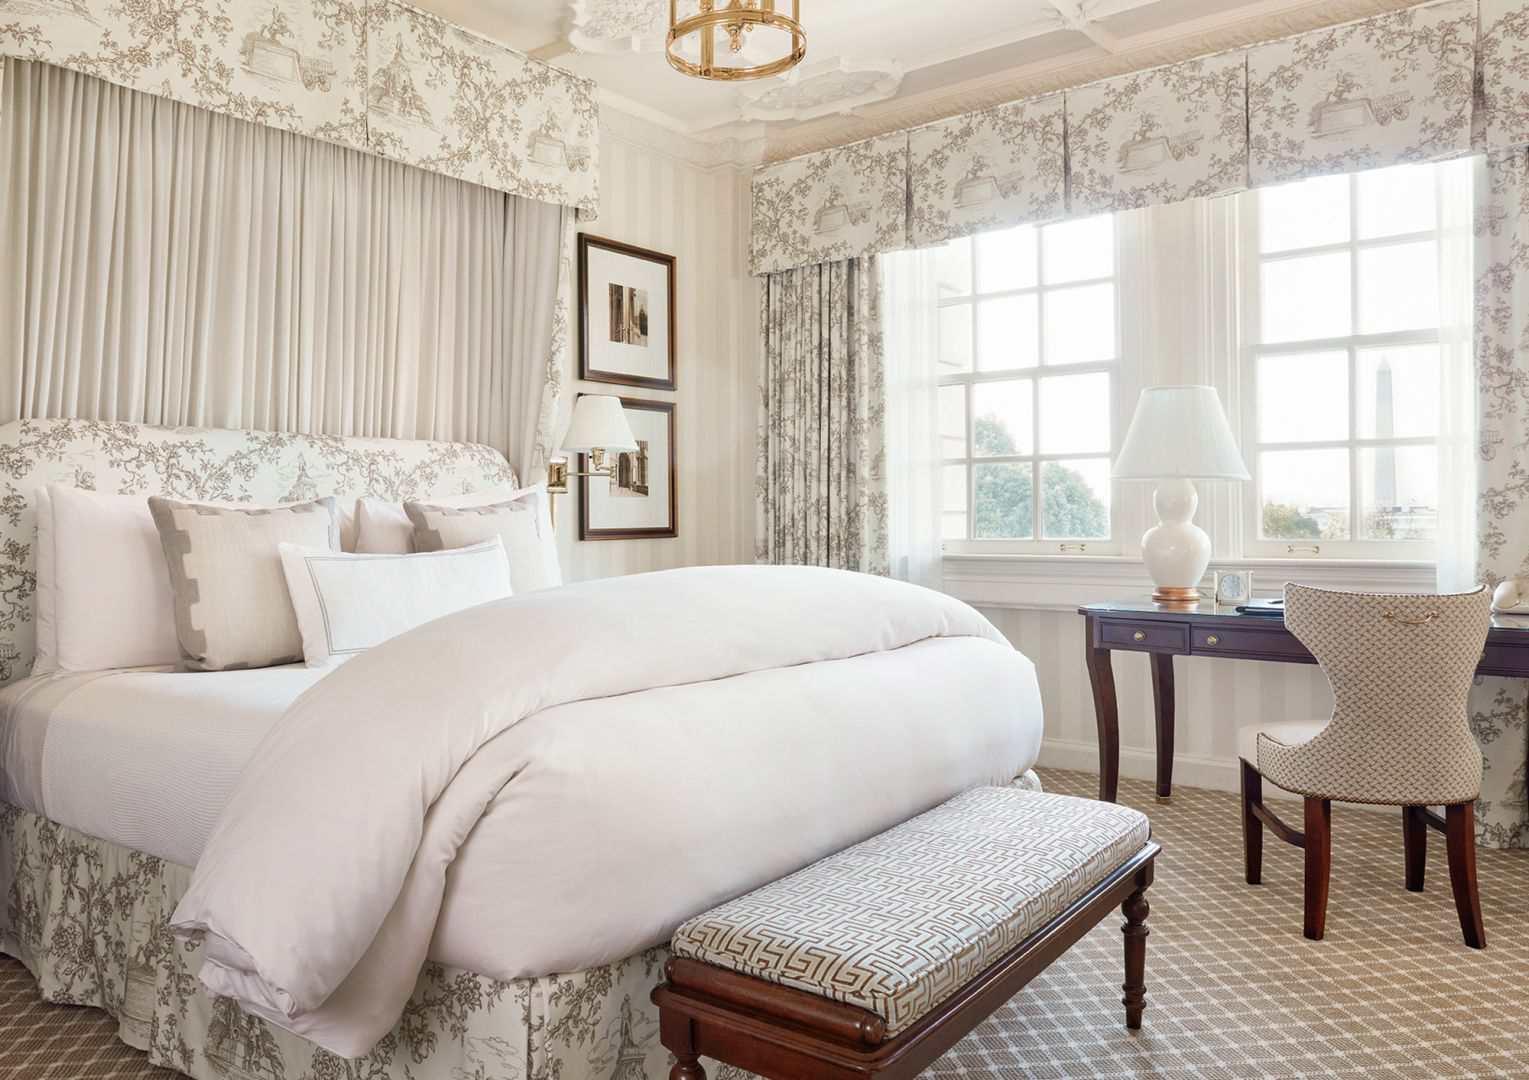 A guest room at the Hay-Adams